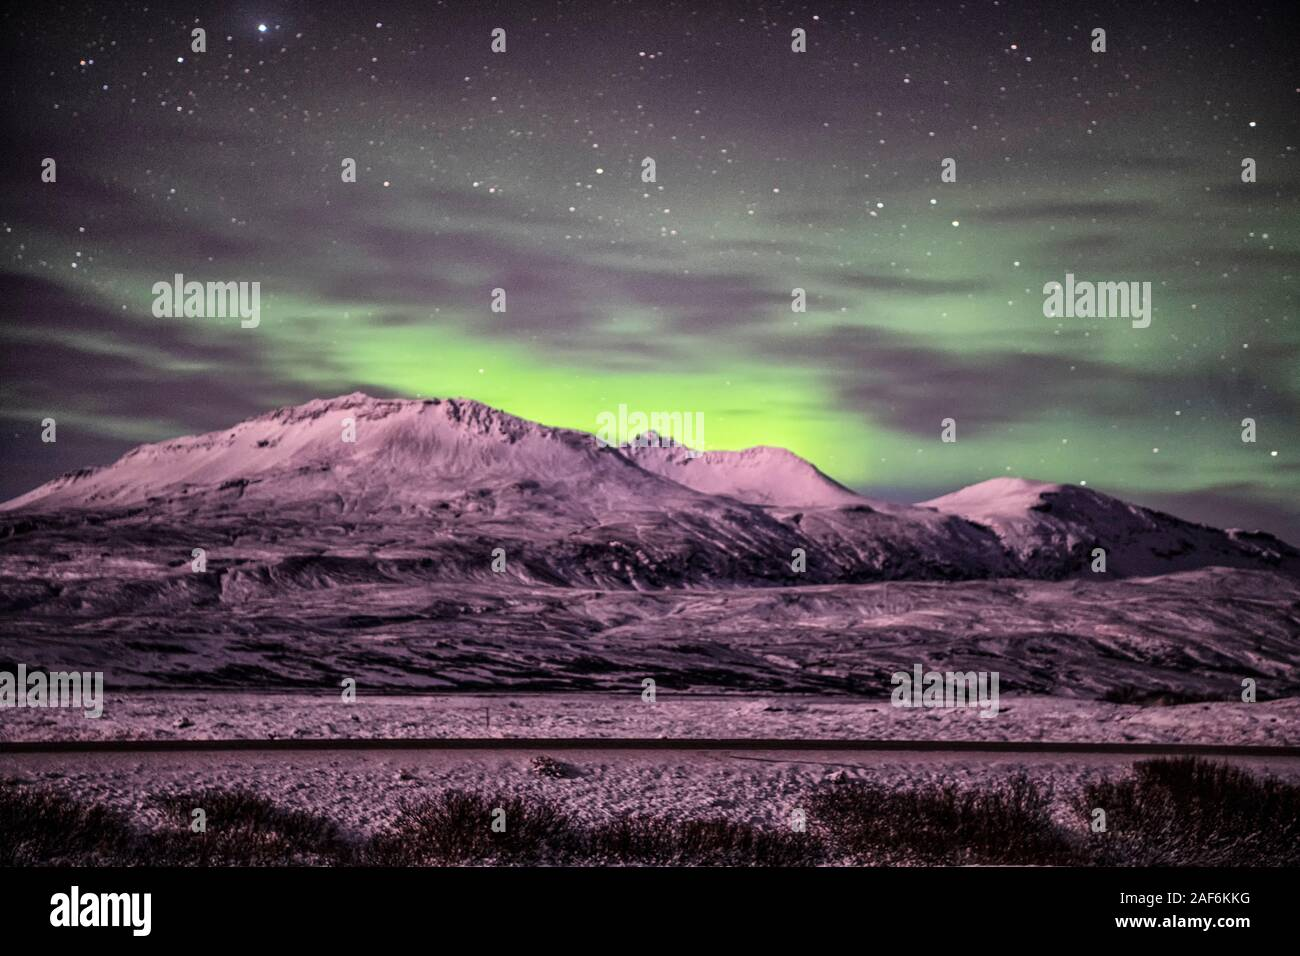 Northern lights over the mountain in Reykjavik Iceland, Aurora Polaris, also know as Northern Lights Aurora Borealis, Stock Photo